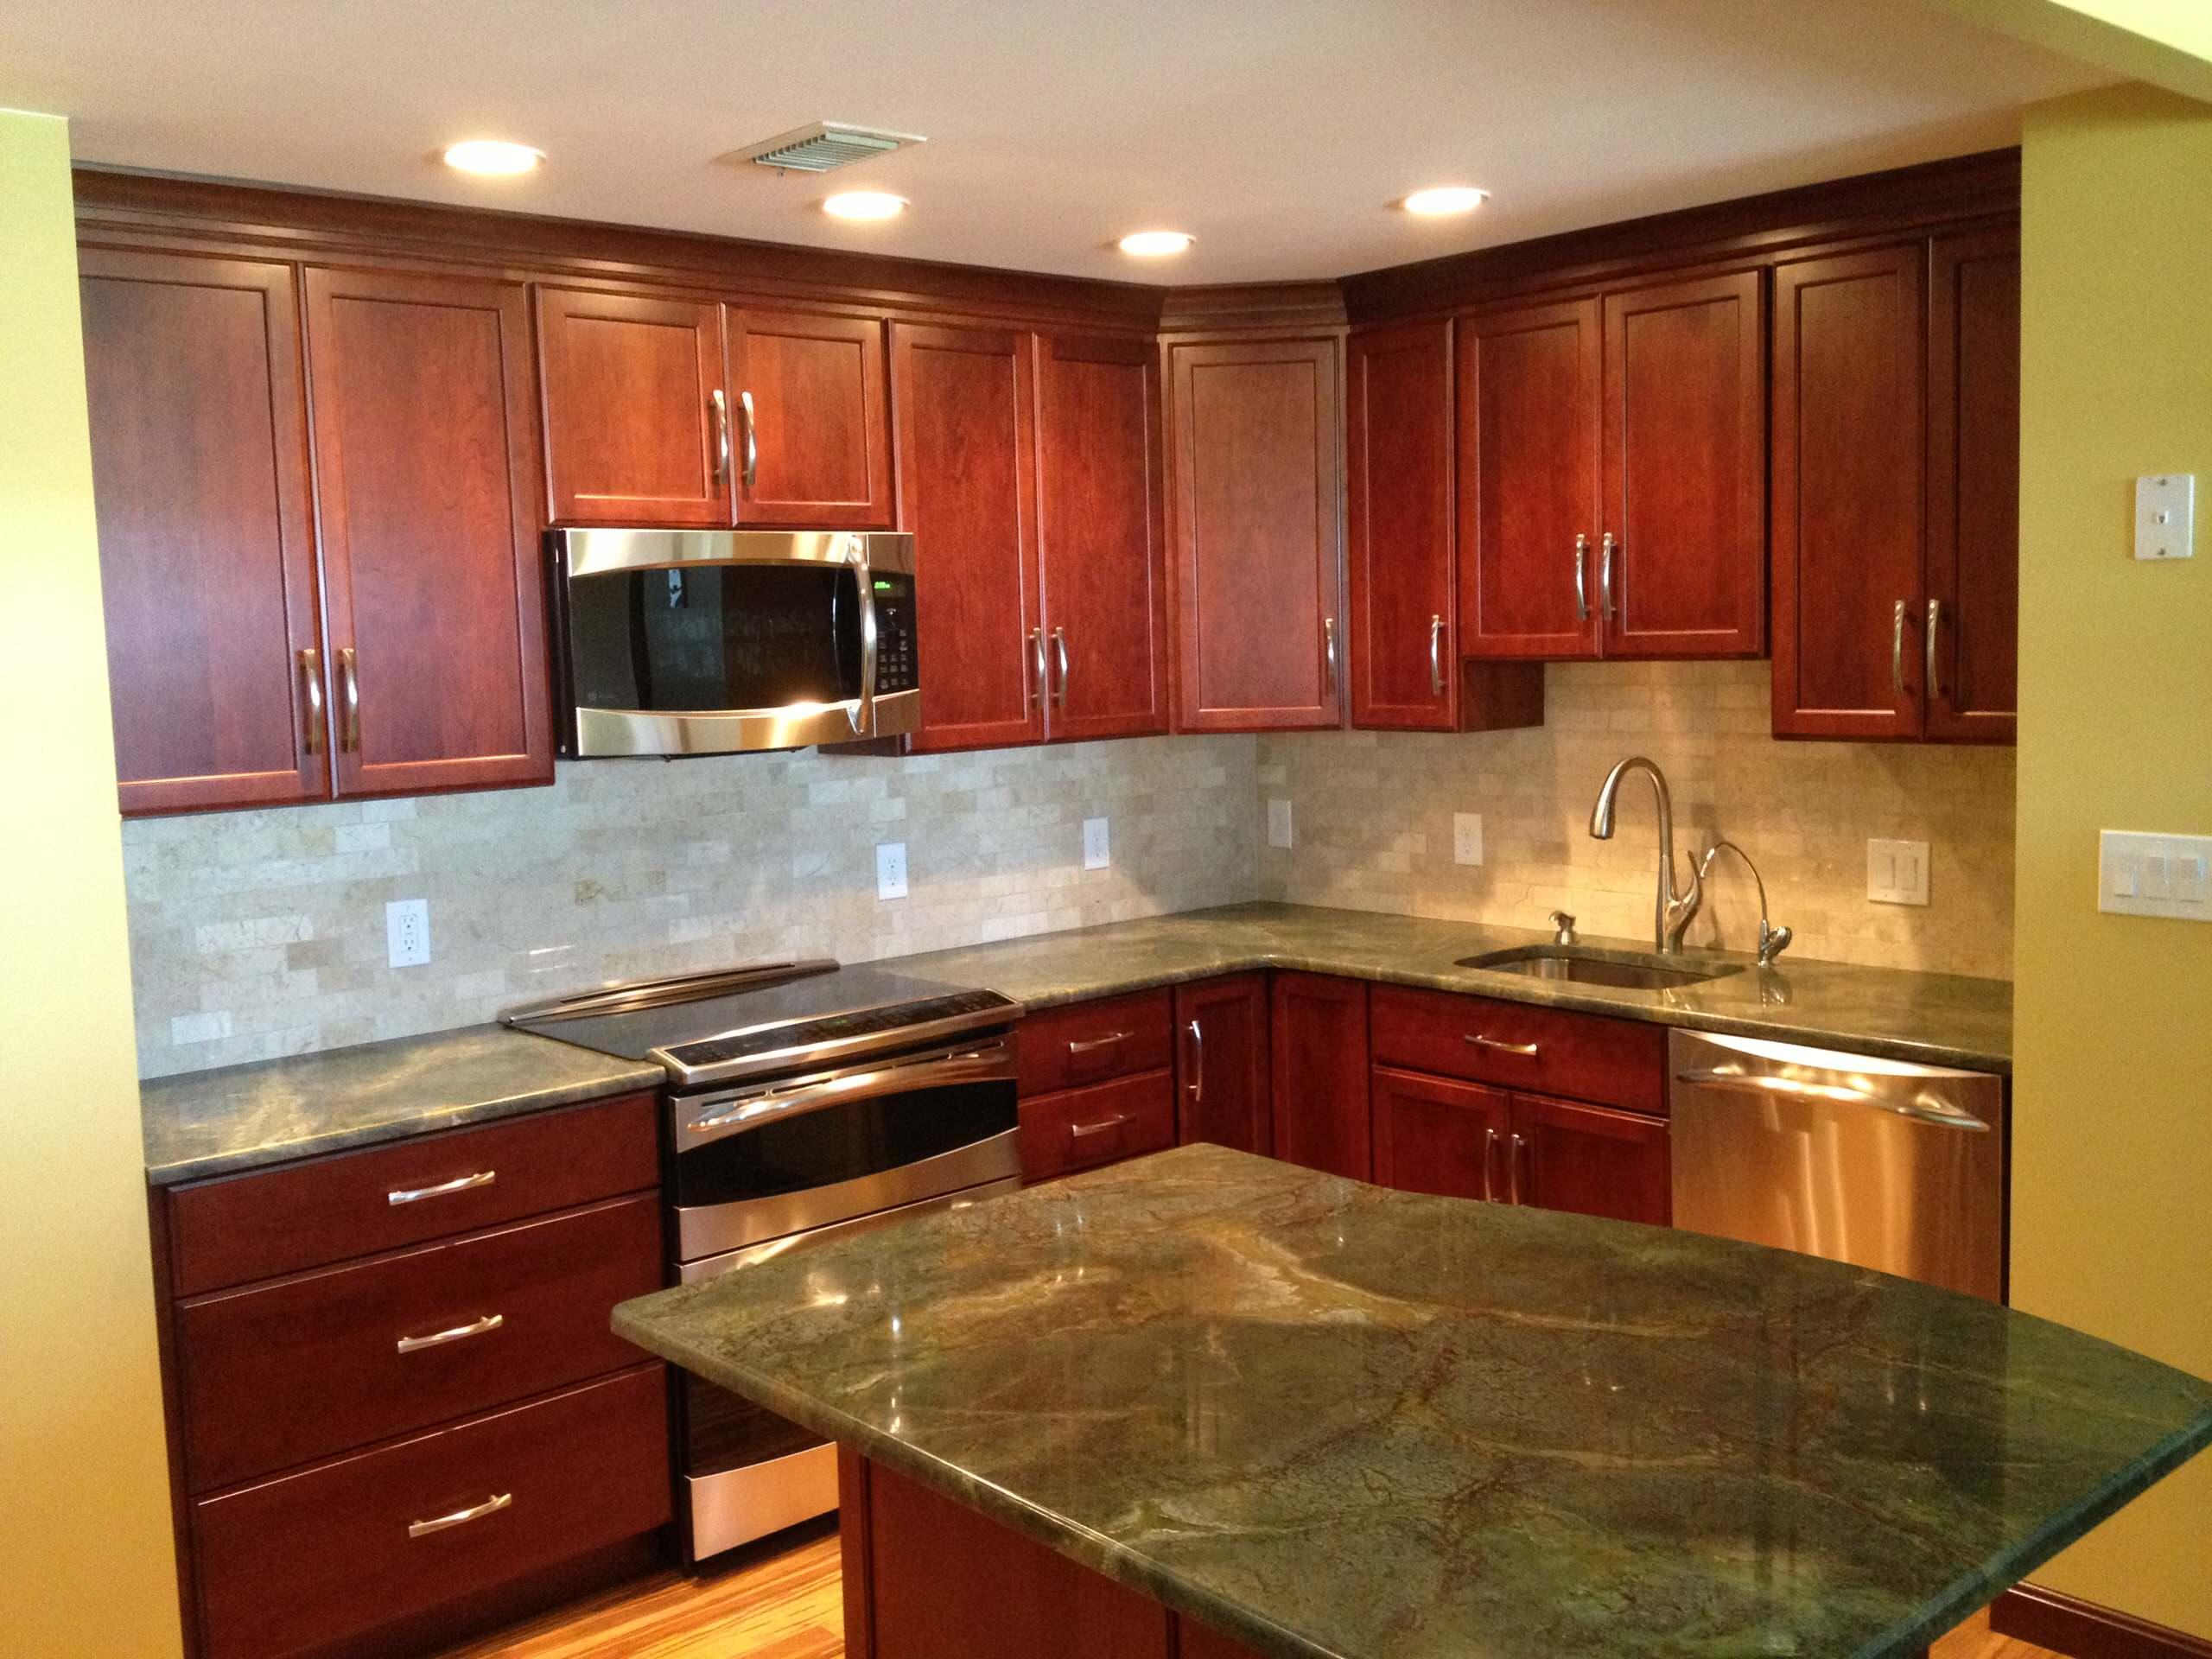 Swampscott kitchen remodel.